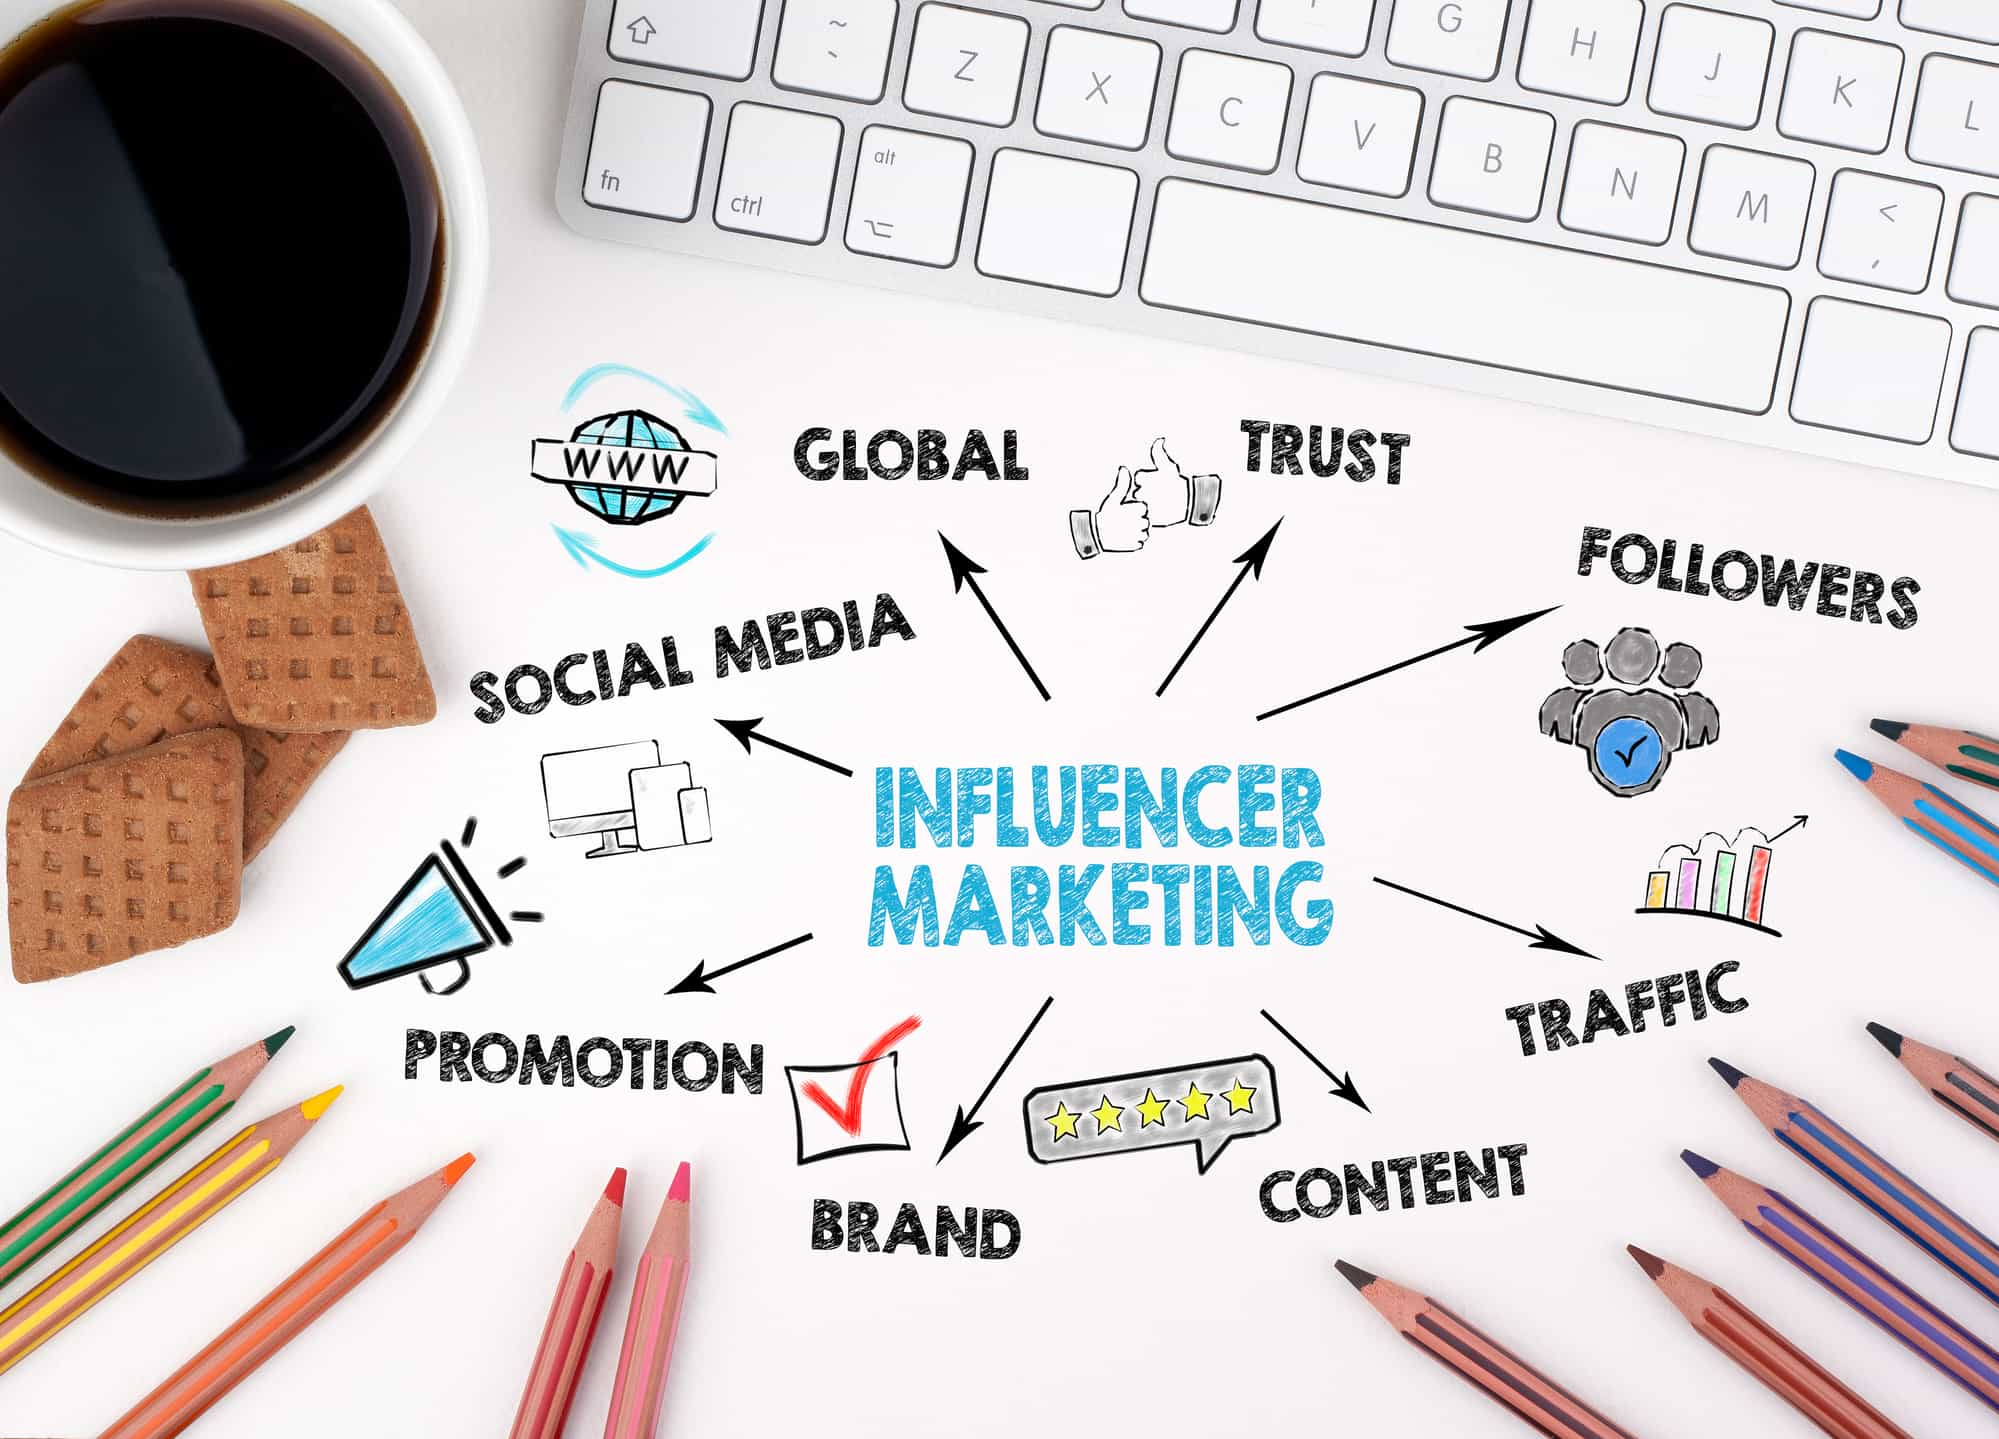 Influencer Marketing - How to Become an Online Influencer